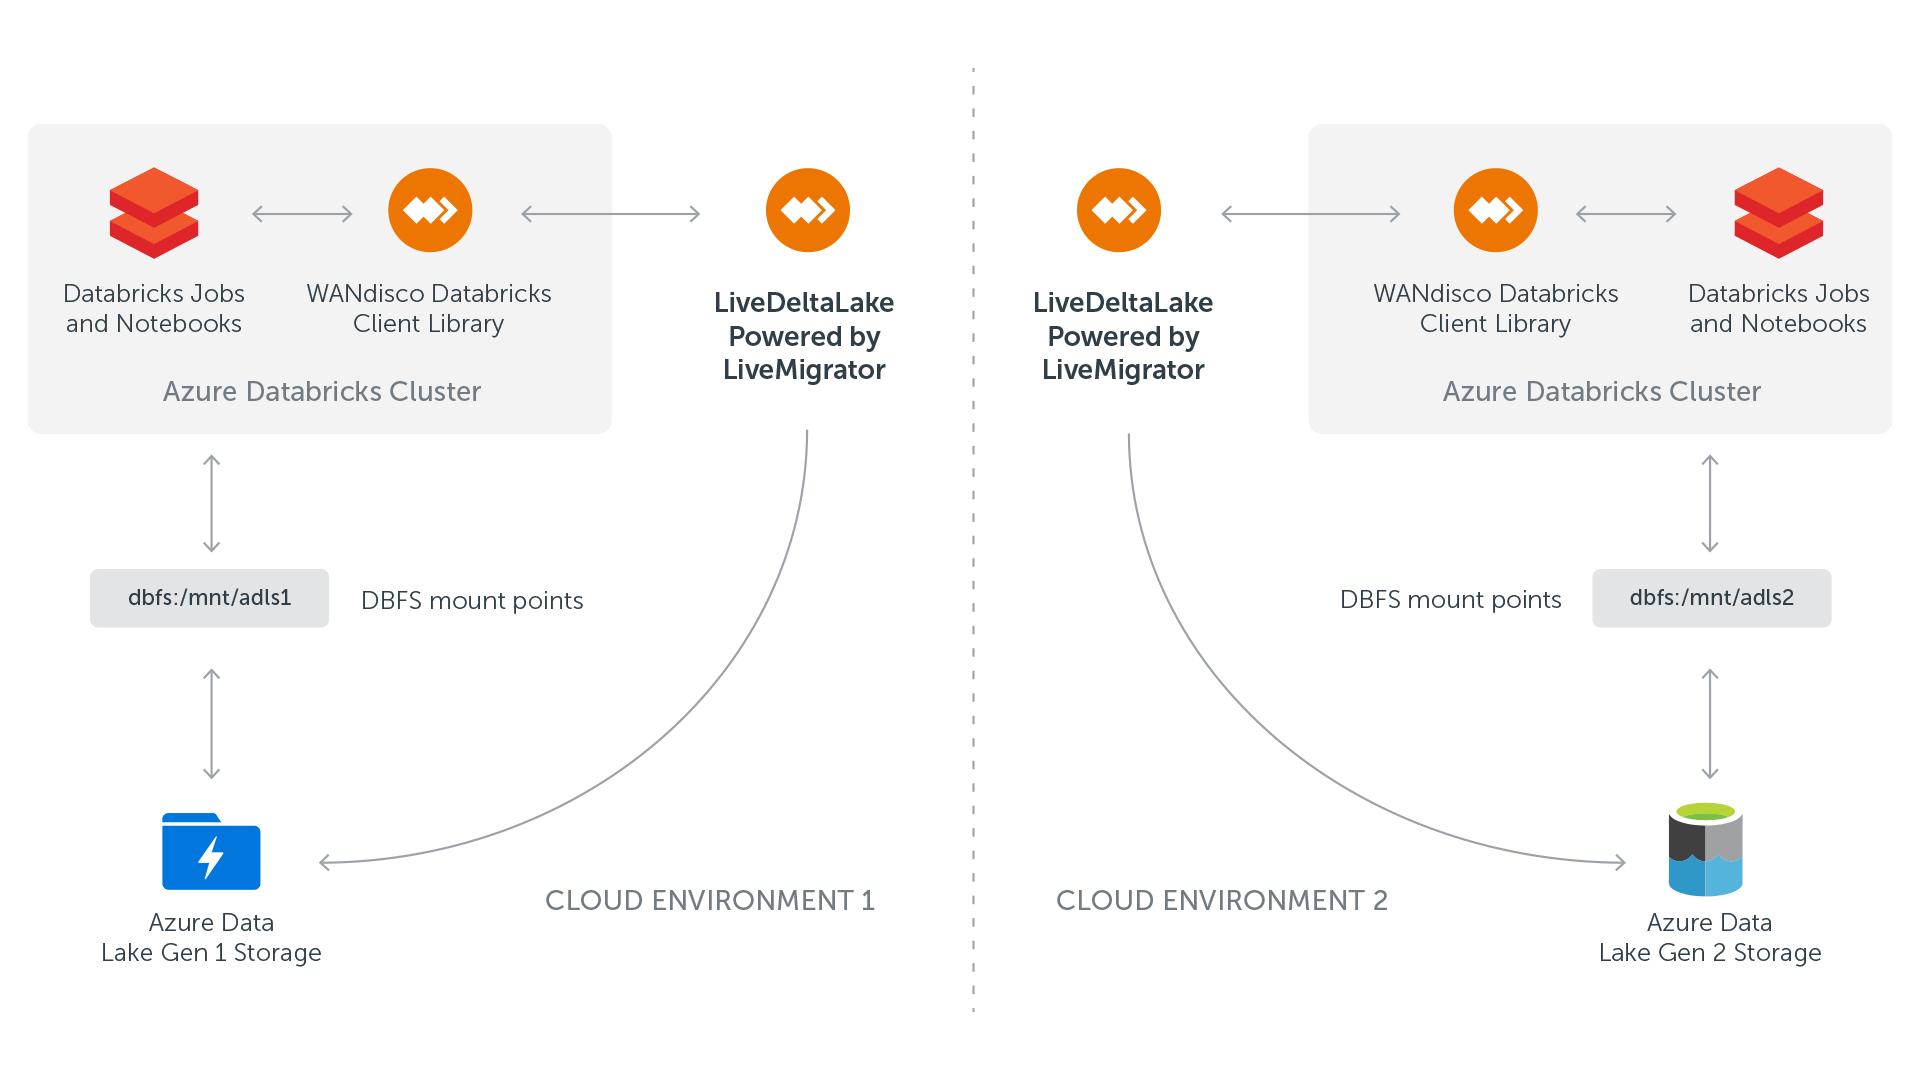 Hadoop/Hive to Databricks with Live Analytics